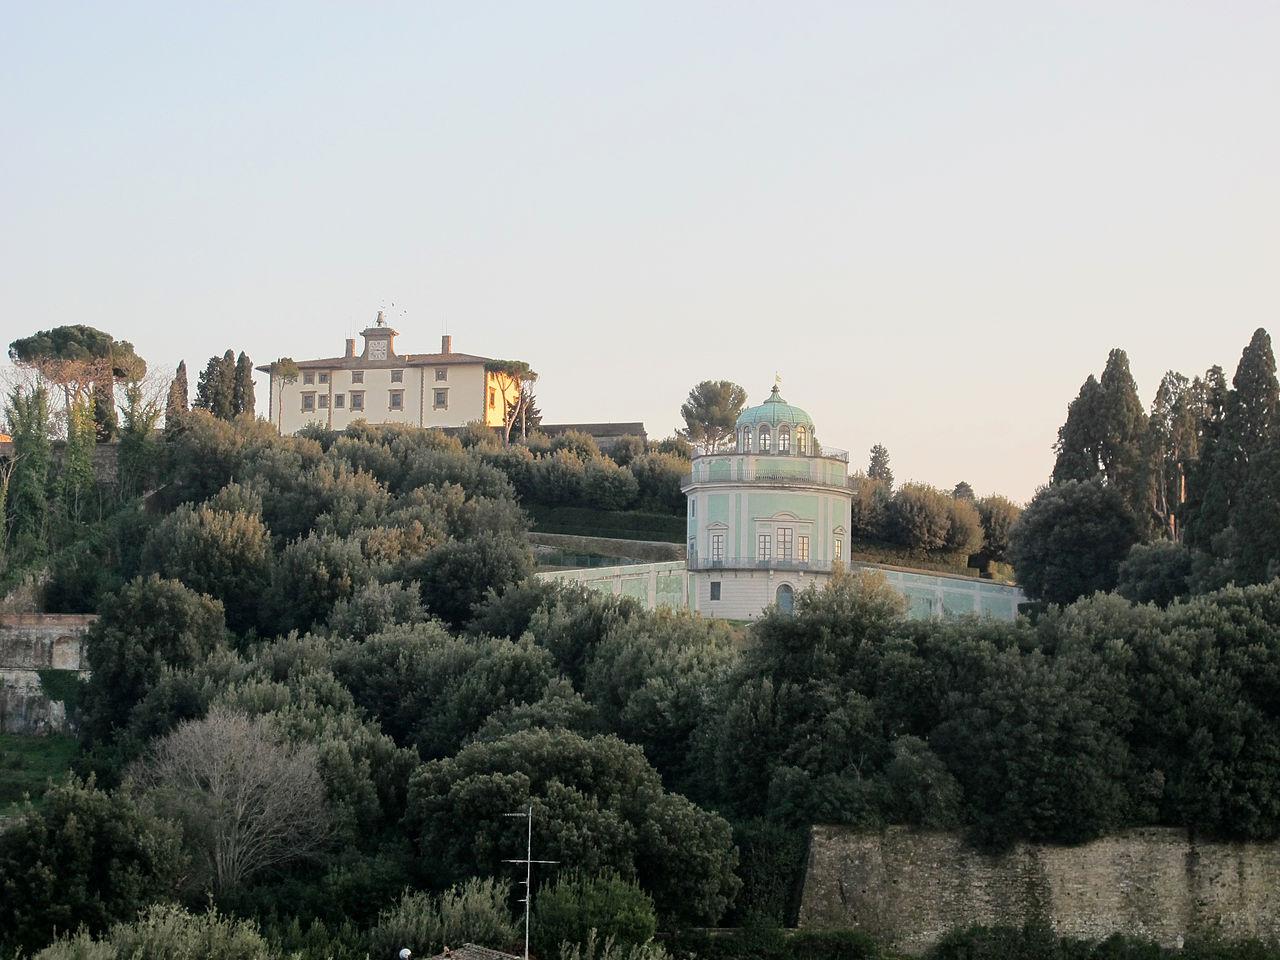 Firenze, Kaffeehaus (Giardino di Boboli) e Forte Belvedere visto da Palazzo Franceschi-Dragomanni